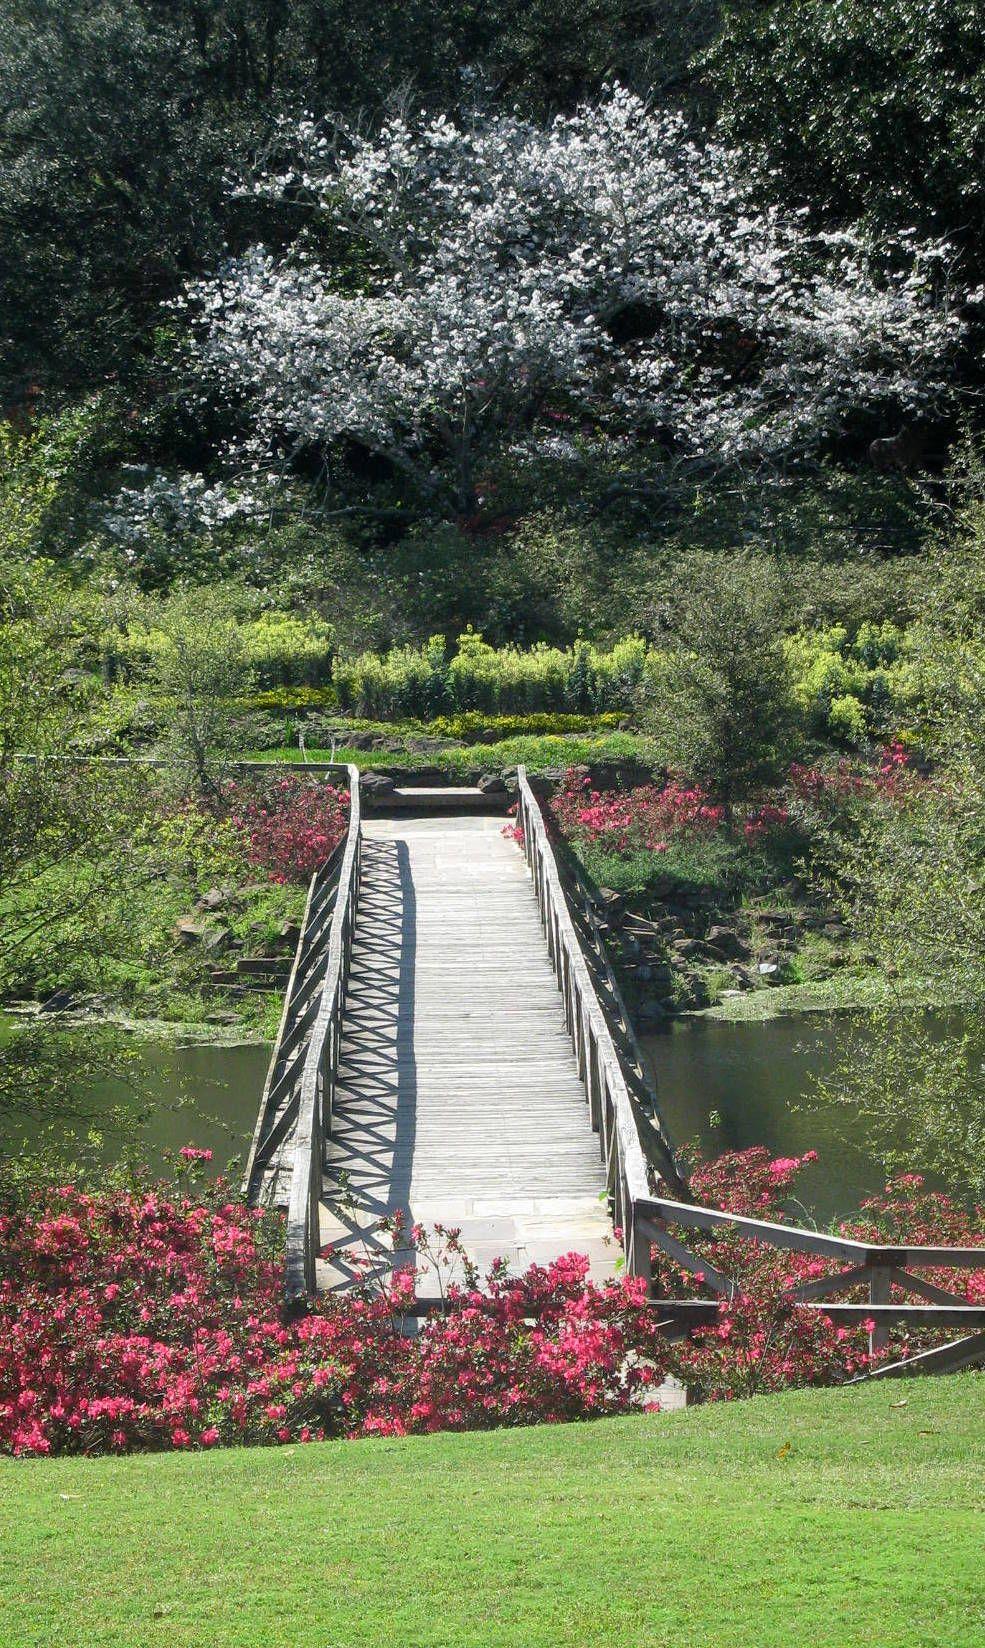 Bellingrath gardens mobile al gulf coast roadtrip in - Southern homes and gardens montgomery al ...